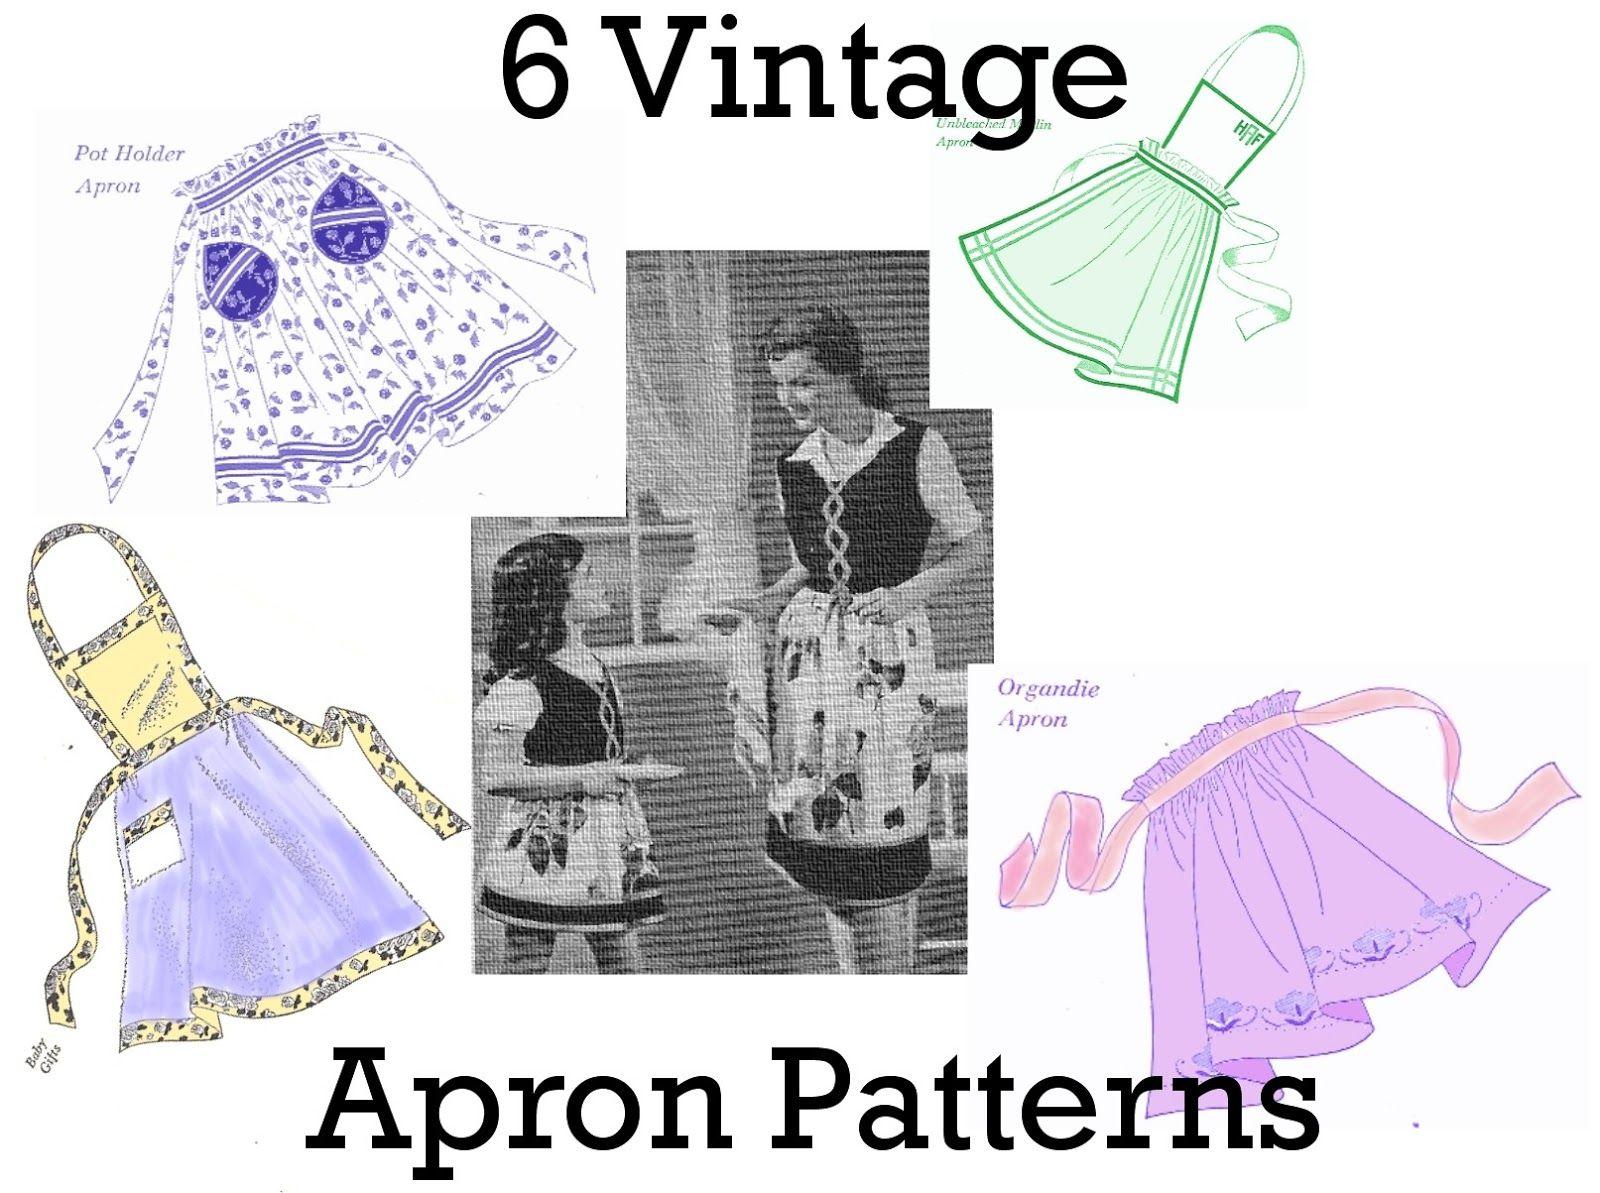 Vintage+Apron+Patterns+Free | FREE .PDF of 6 Vintage Apron Patterns ...